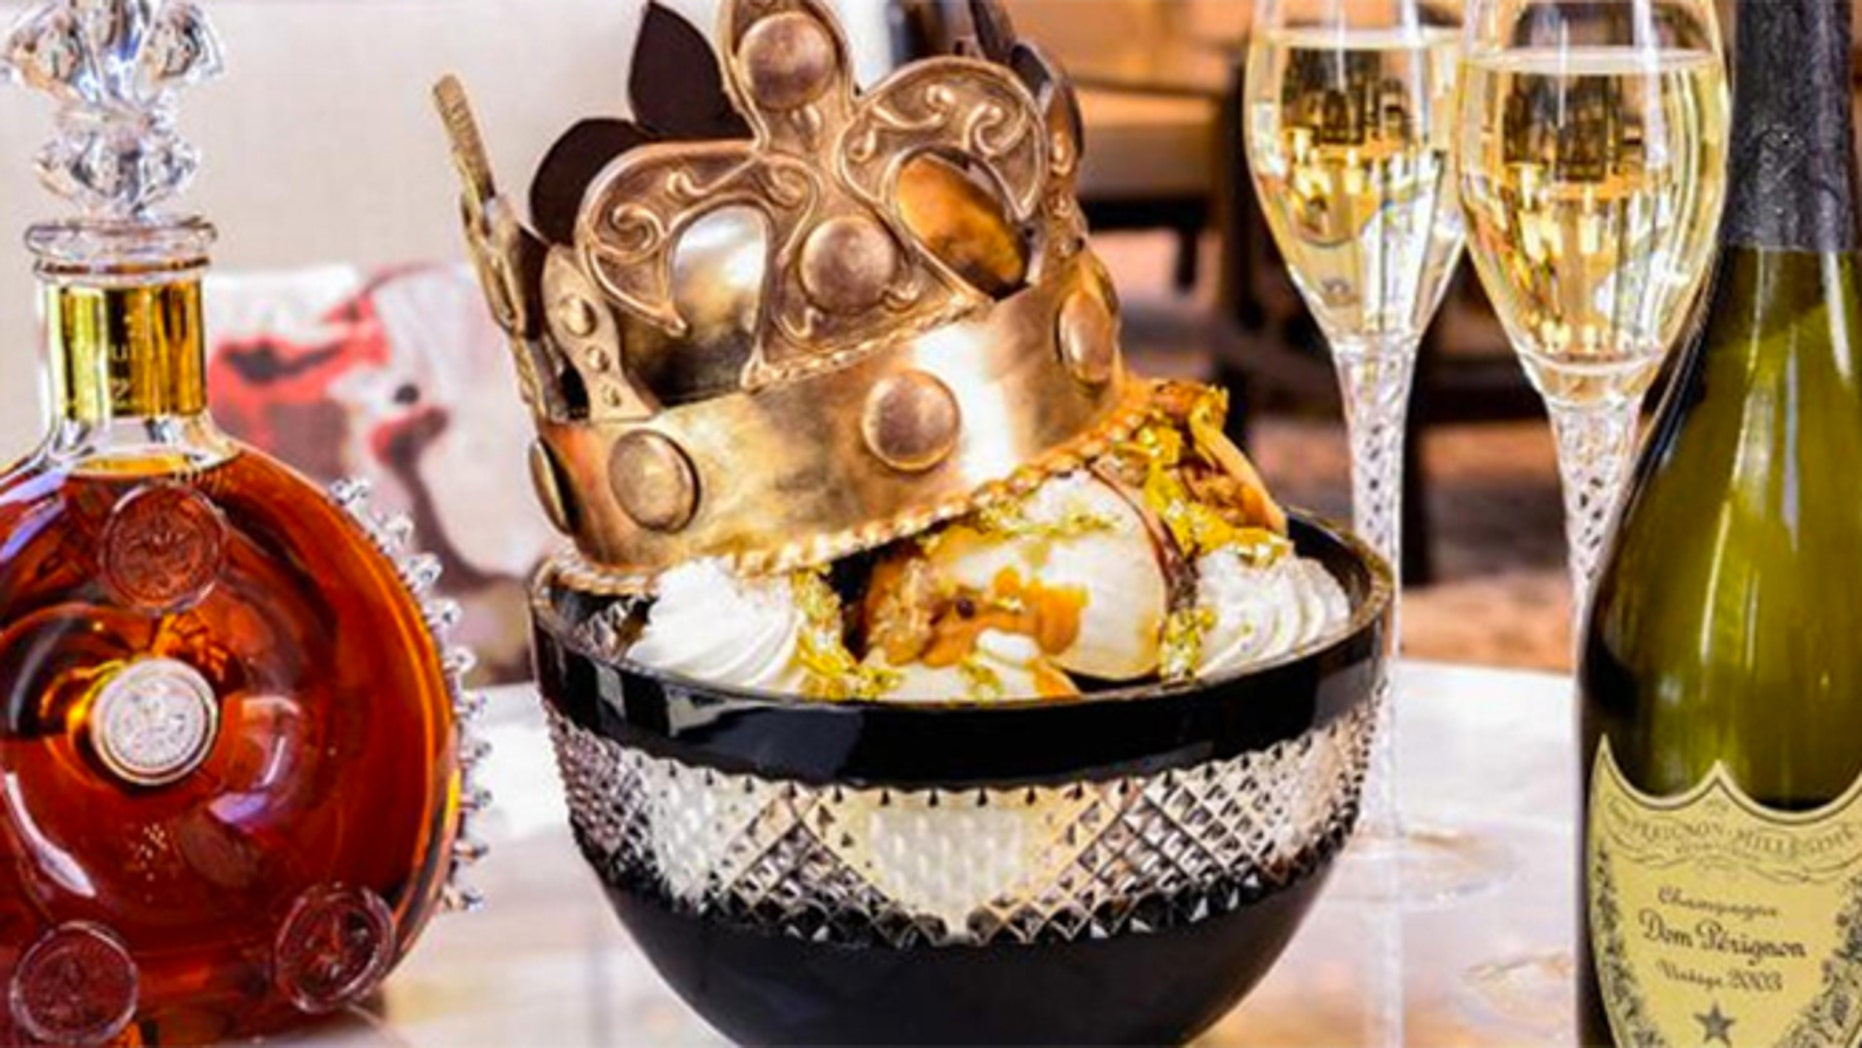 Chicago's Langham hotel is serving the $1000 Victoria sundae.